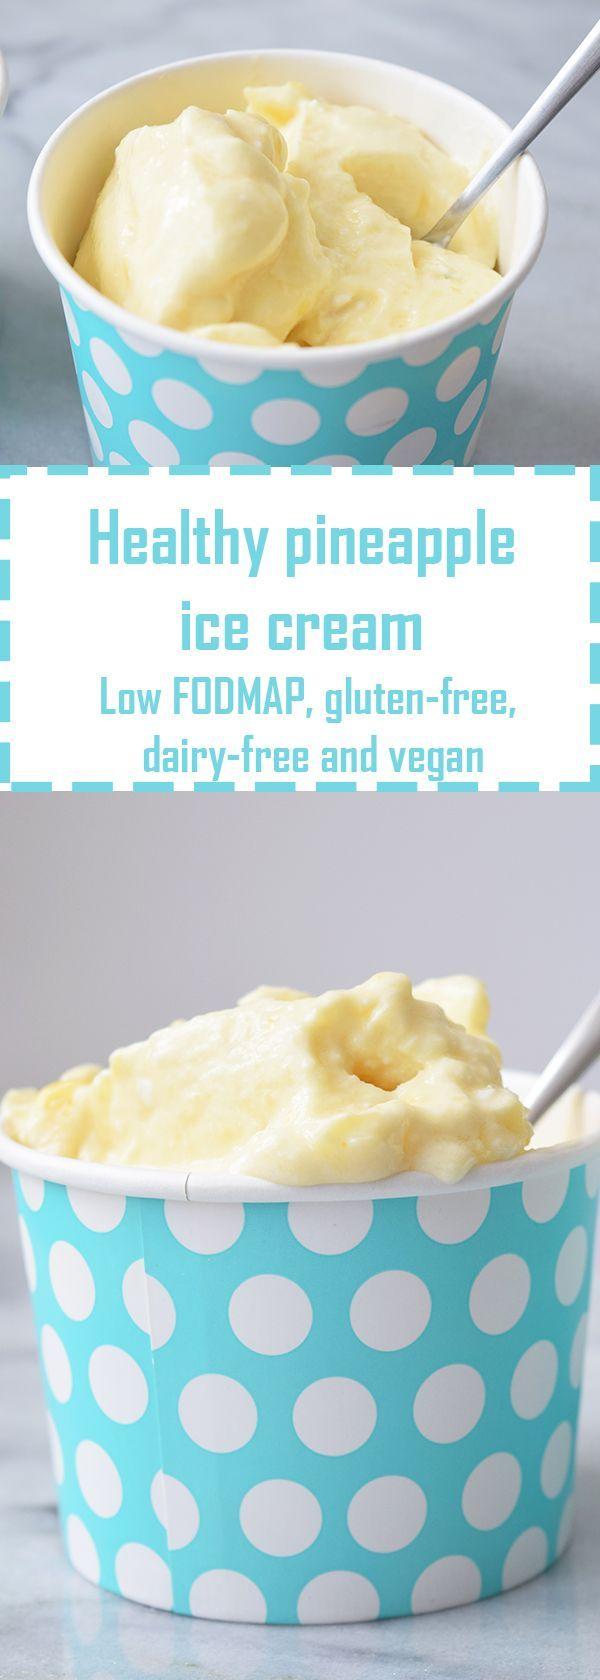 Healthy Pineapple Ice Cream Low Fodmap Gluten Free Vegan Recipe Free Desserts Fodmap Pineapple Ice Cream